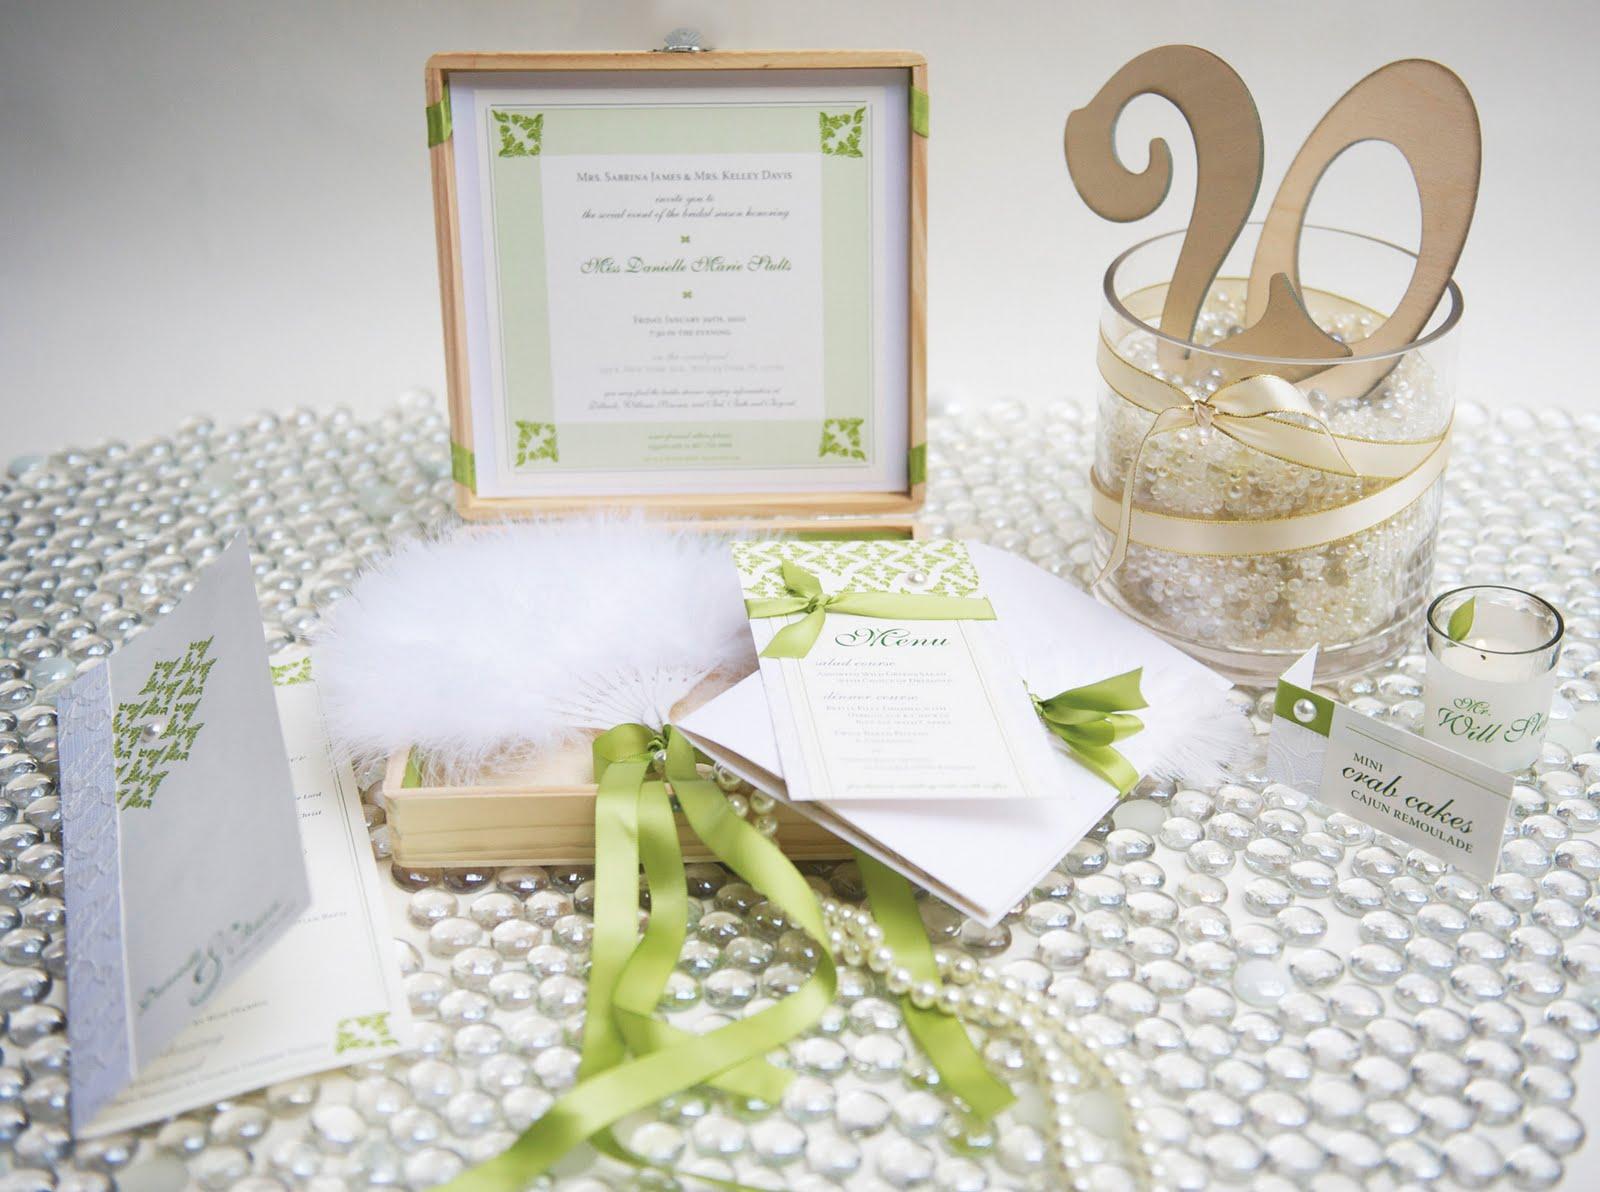 Exciting News 2u!: Modern Day Great Gatsby Wedding Style!